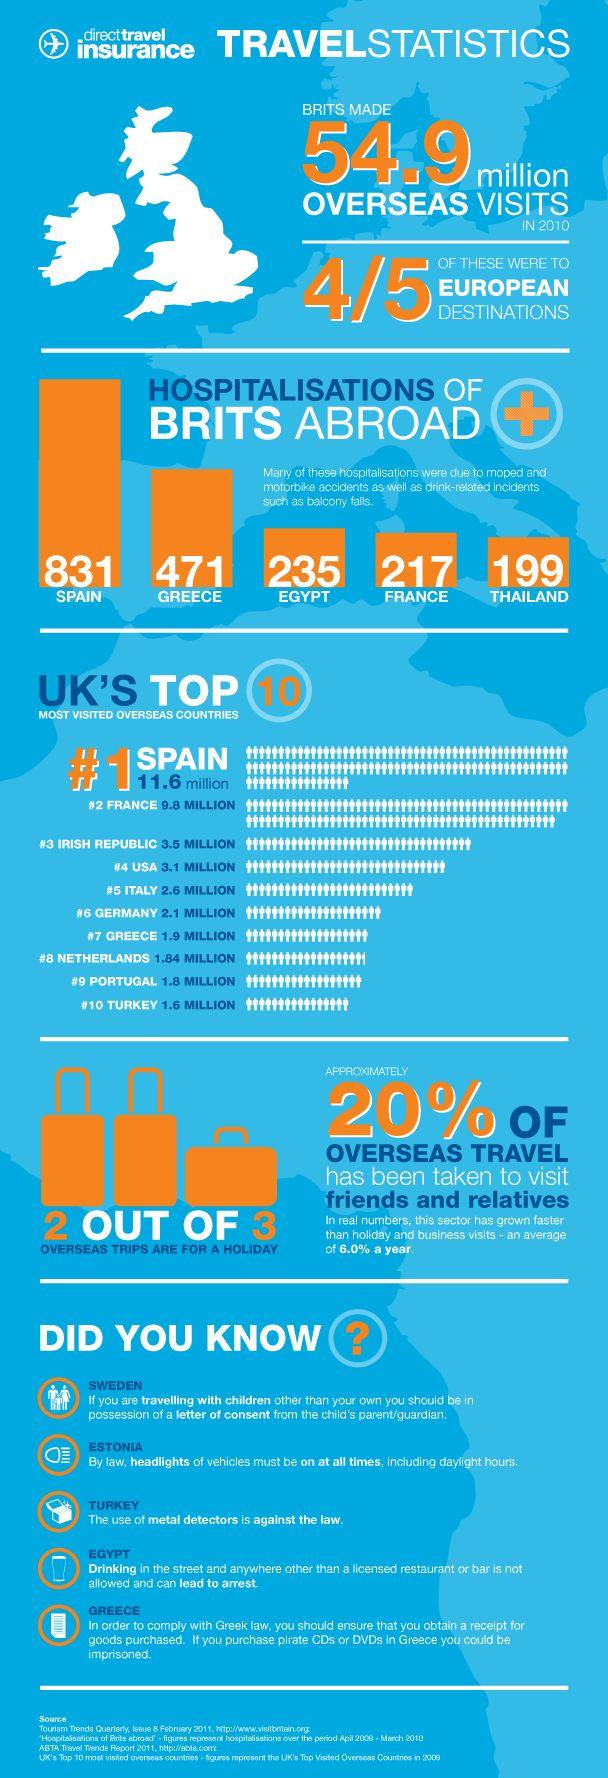 Direct Travel Travel statistics infographic